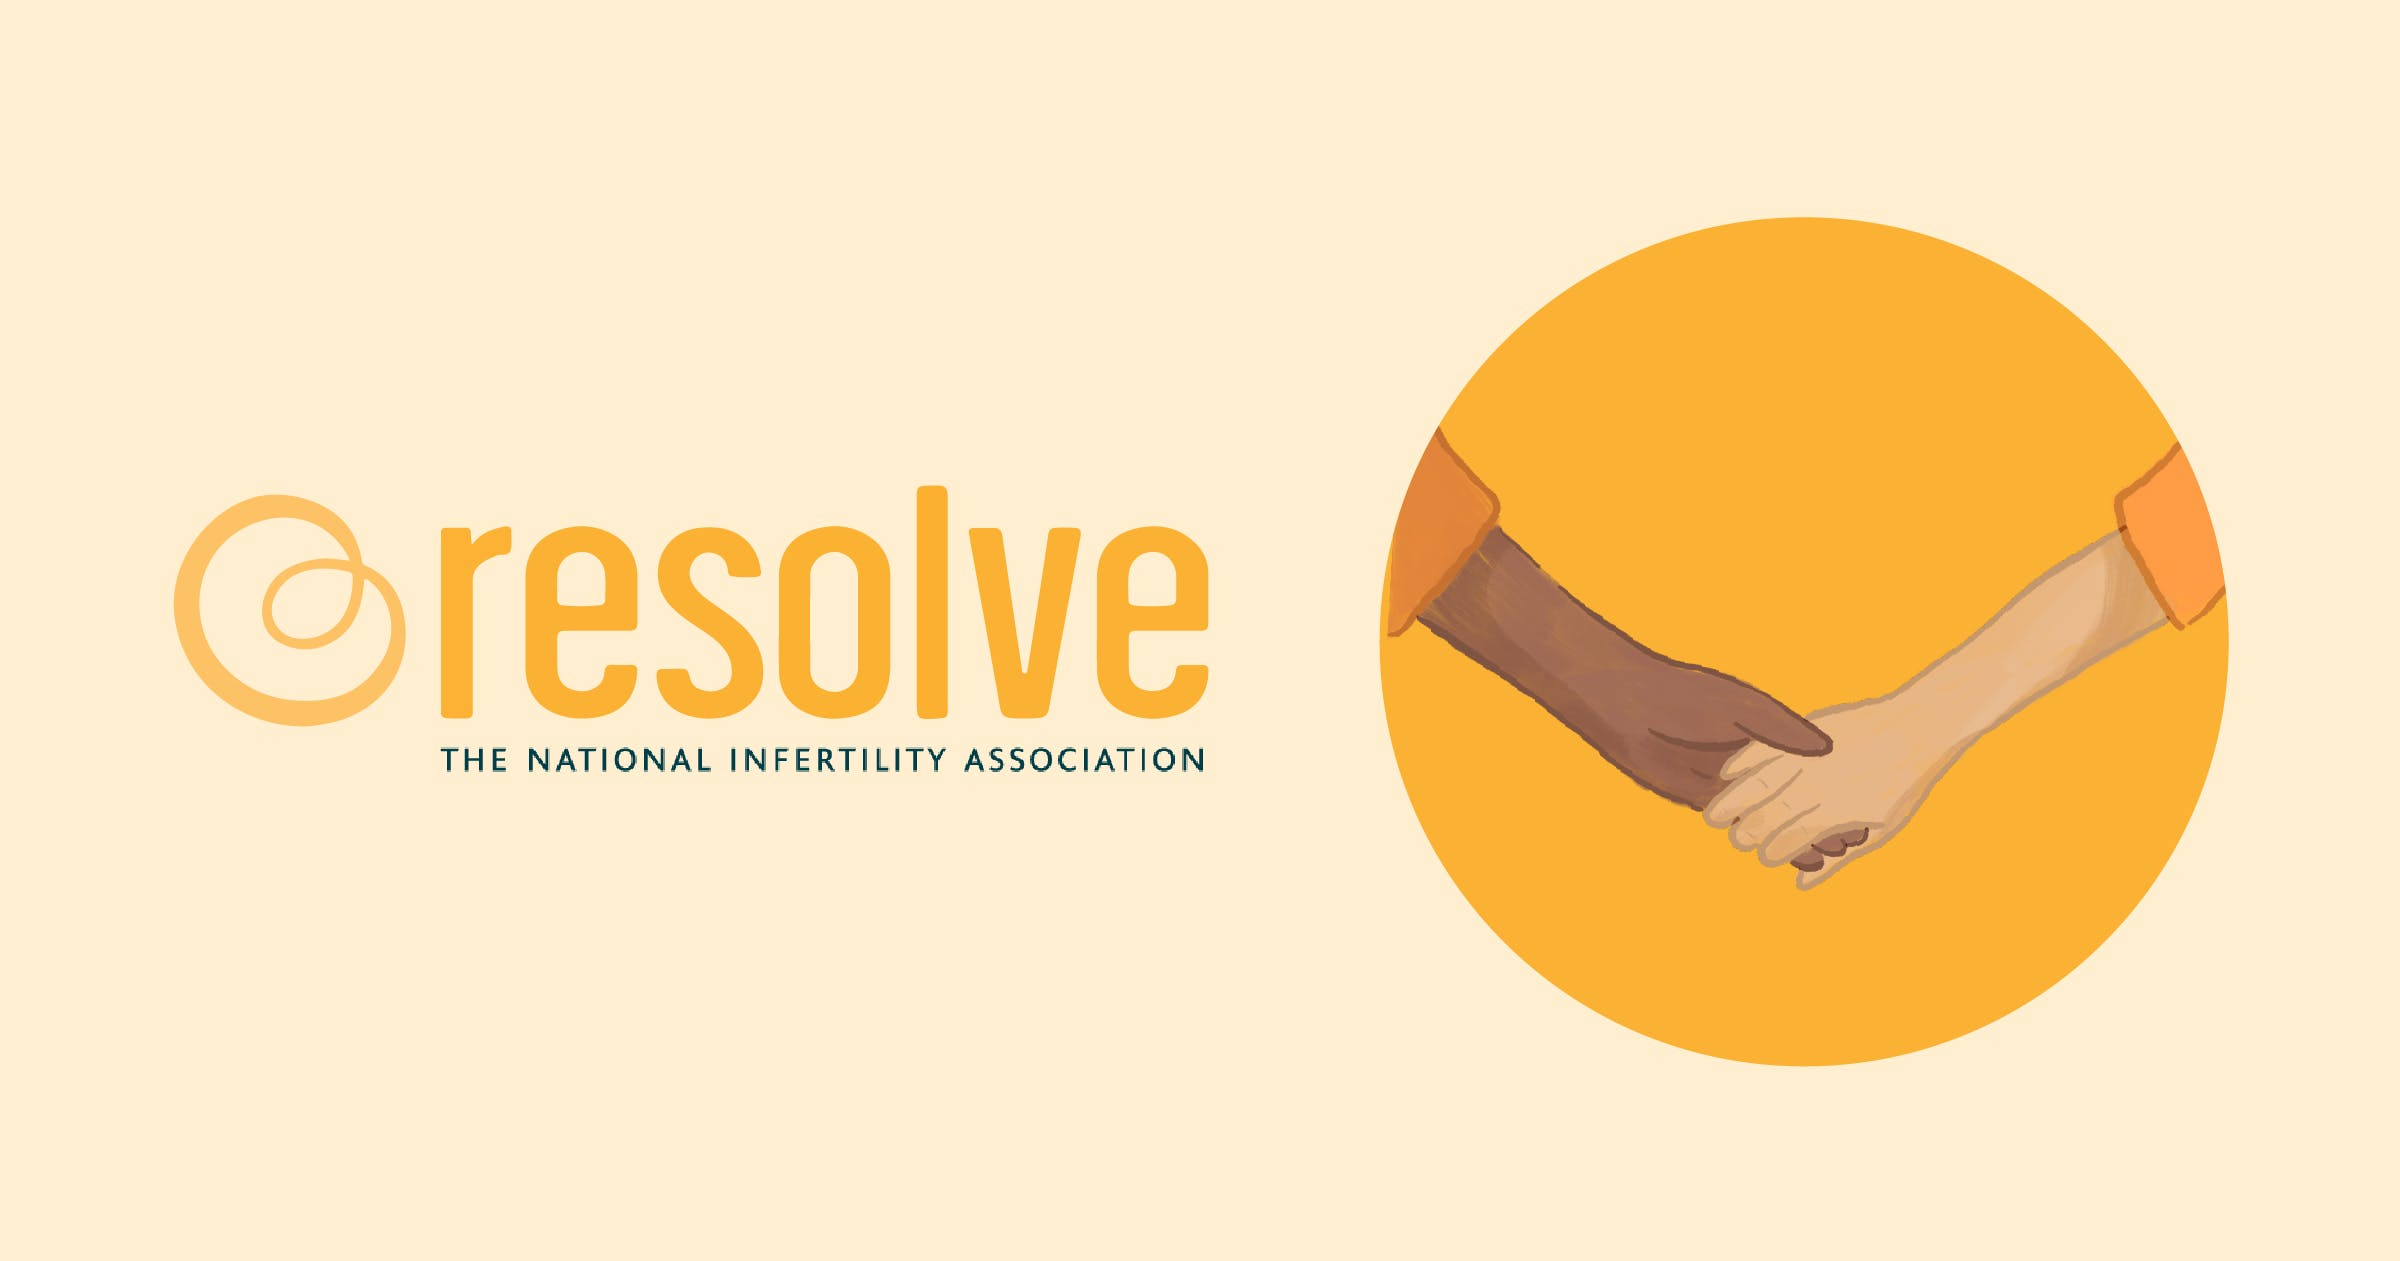 RESOLVE: The National Infertility Association